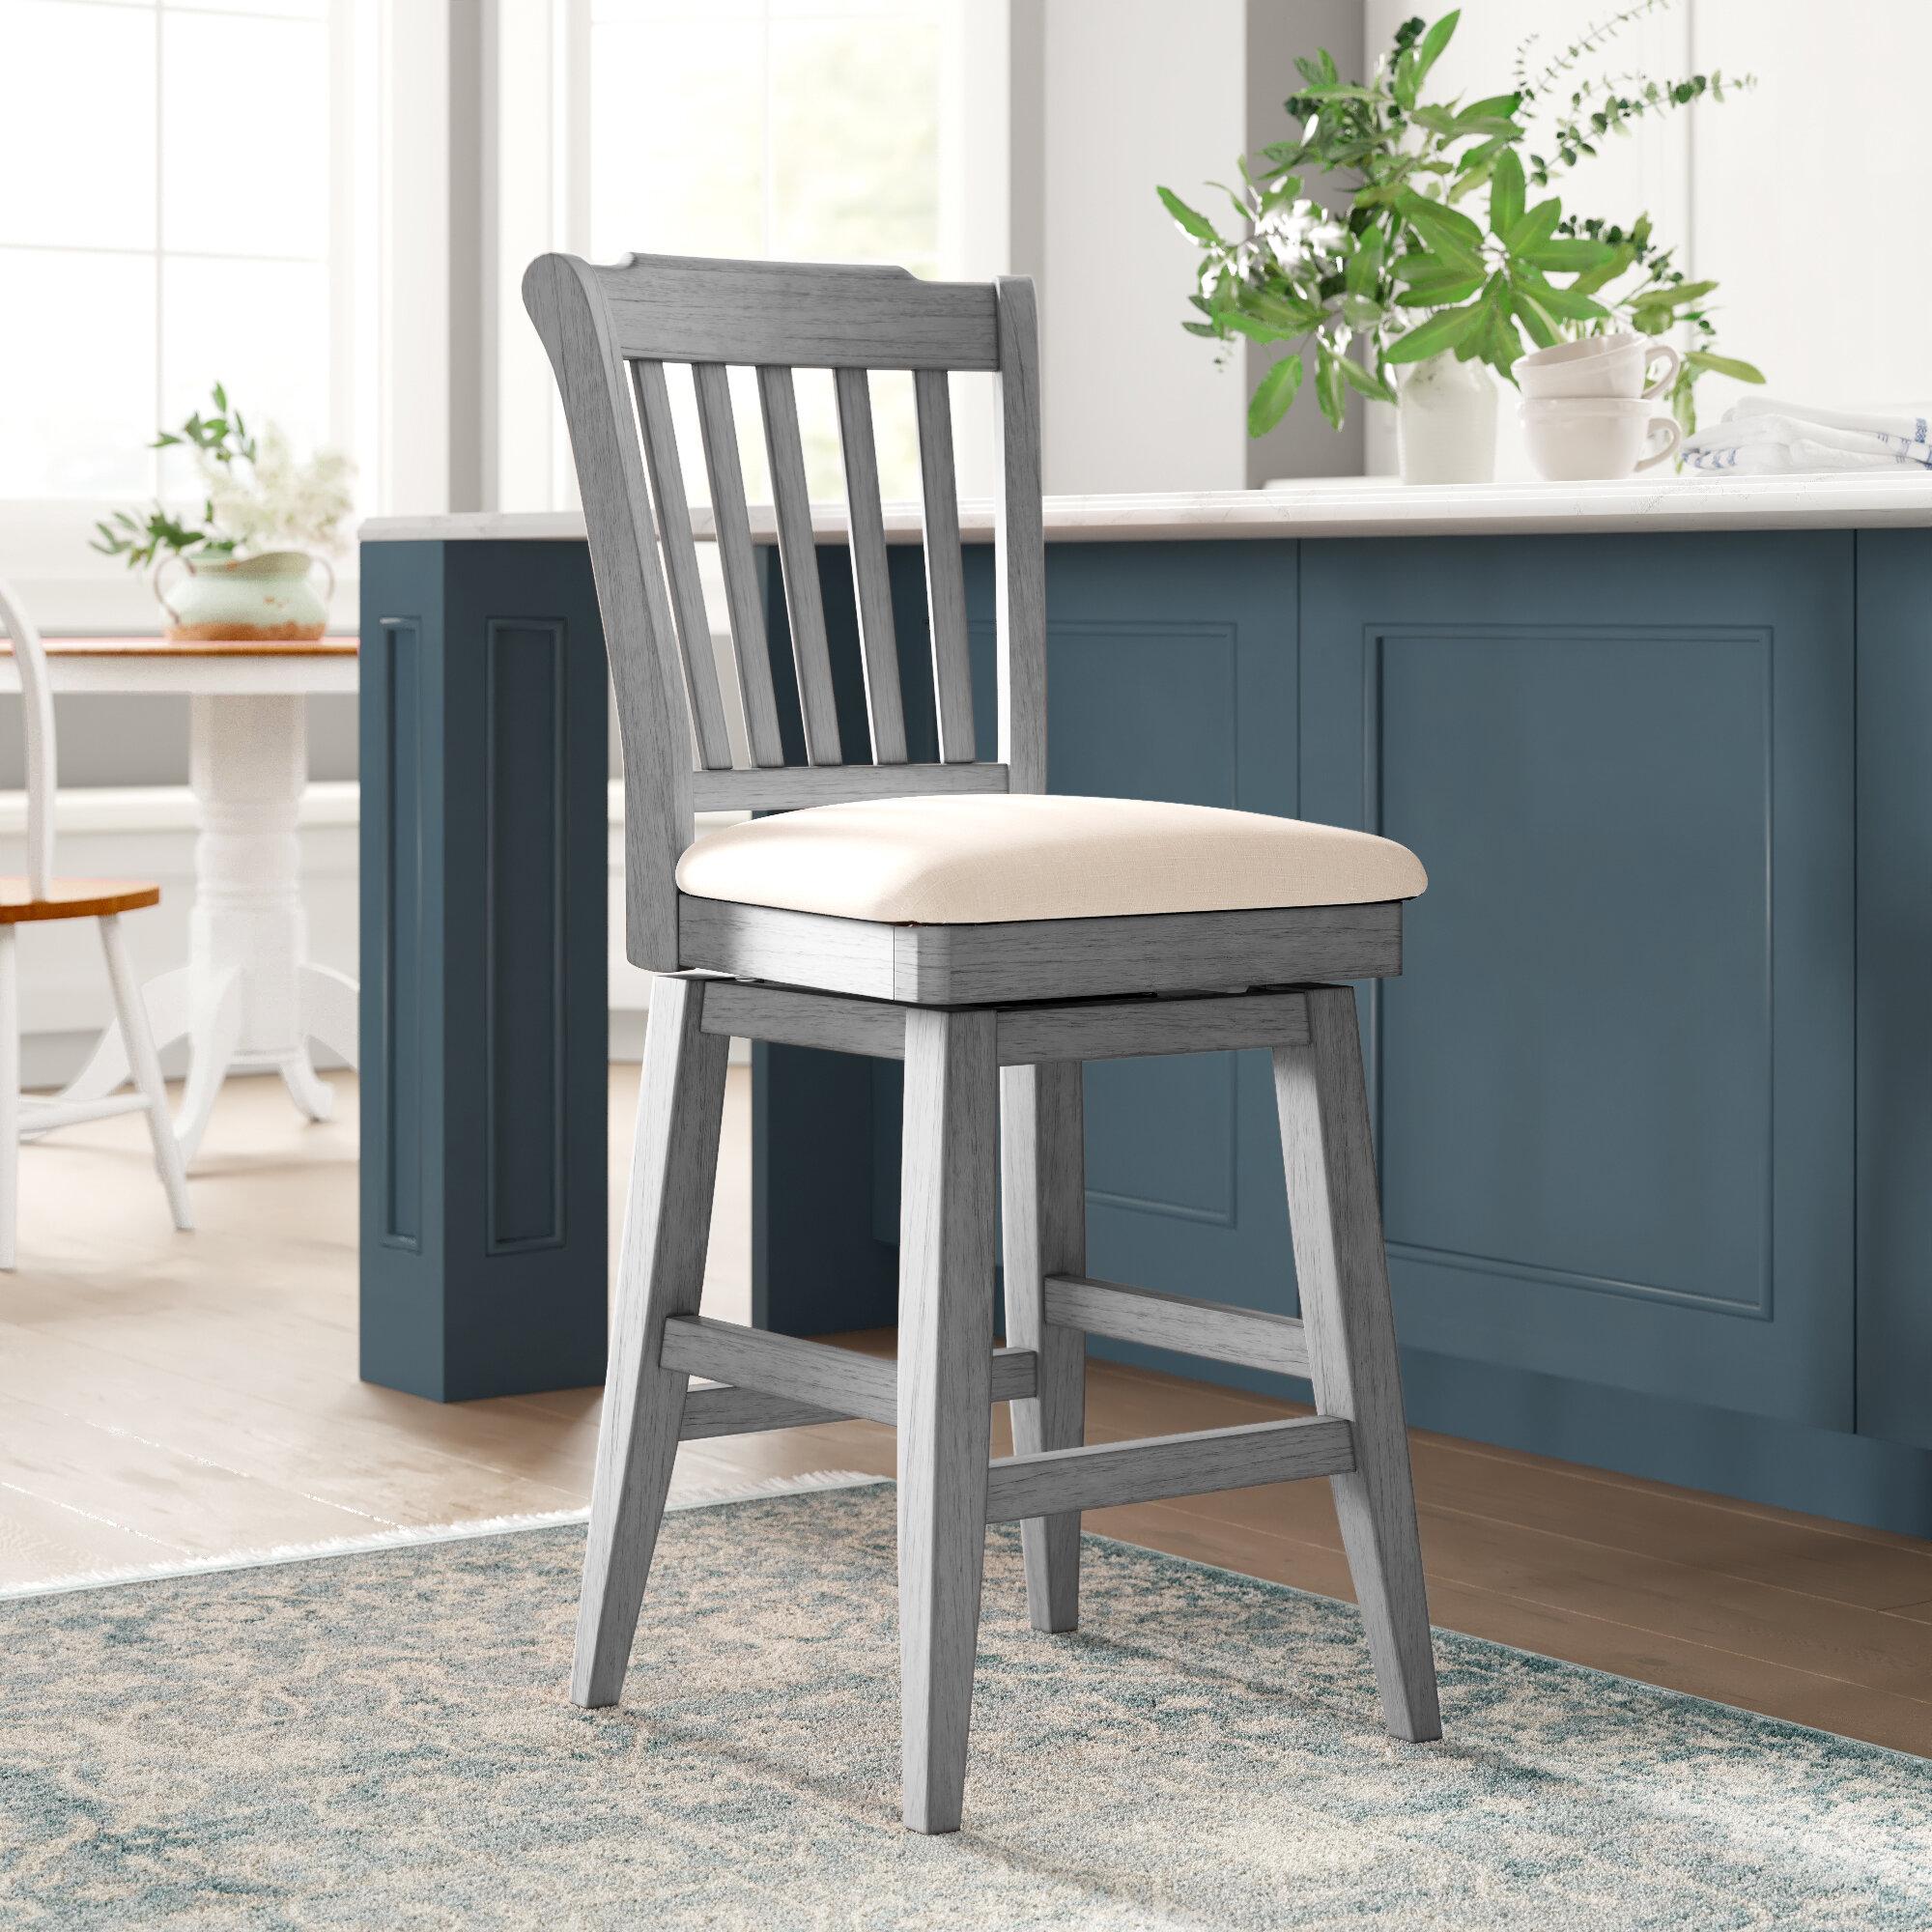 Cool Hiram 25 75 Slat Back Swivel Bar Stool Ibusinesslaw Wood Chair Design Ideas Ibusinesslaworg